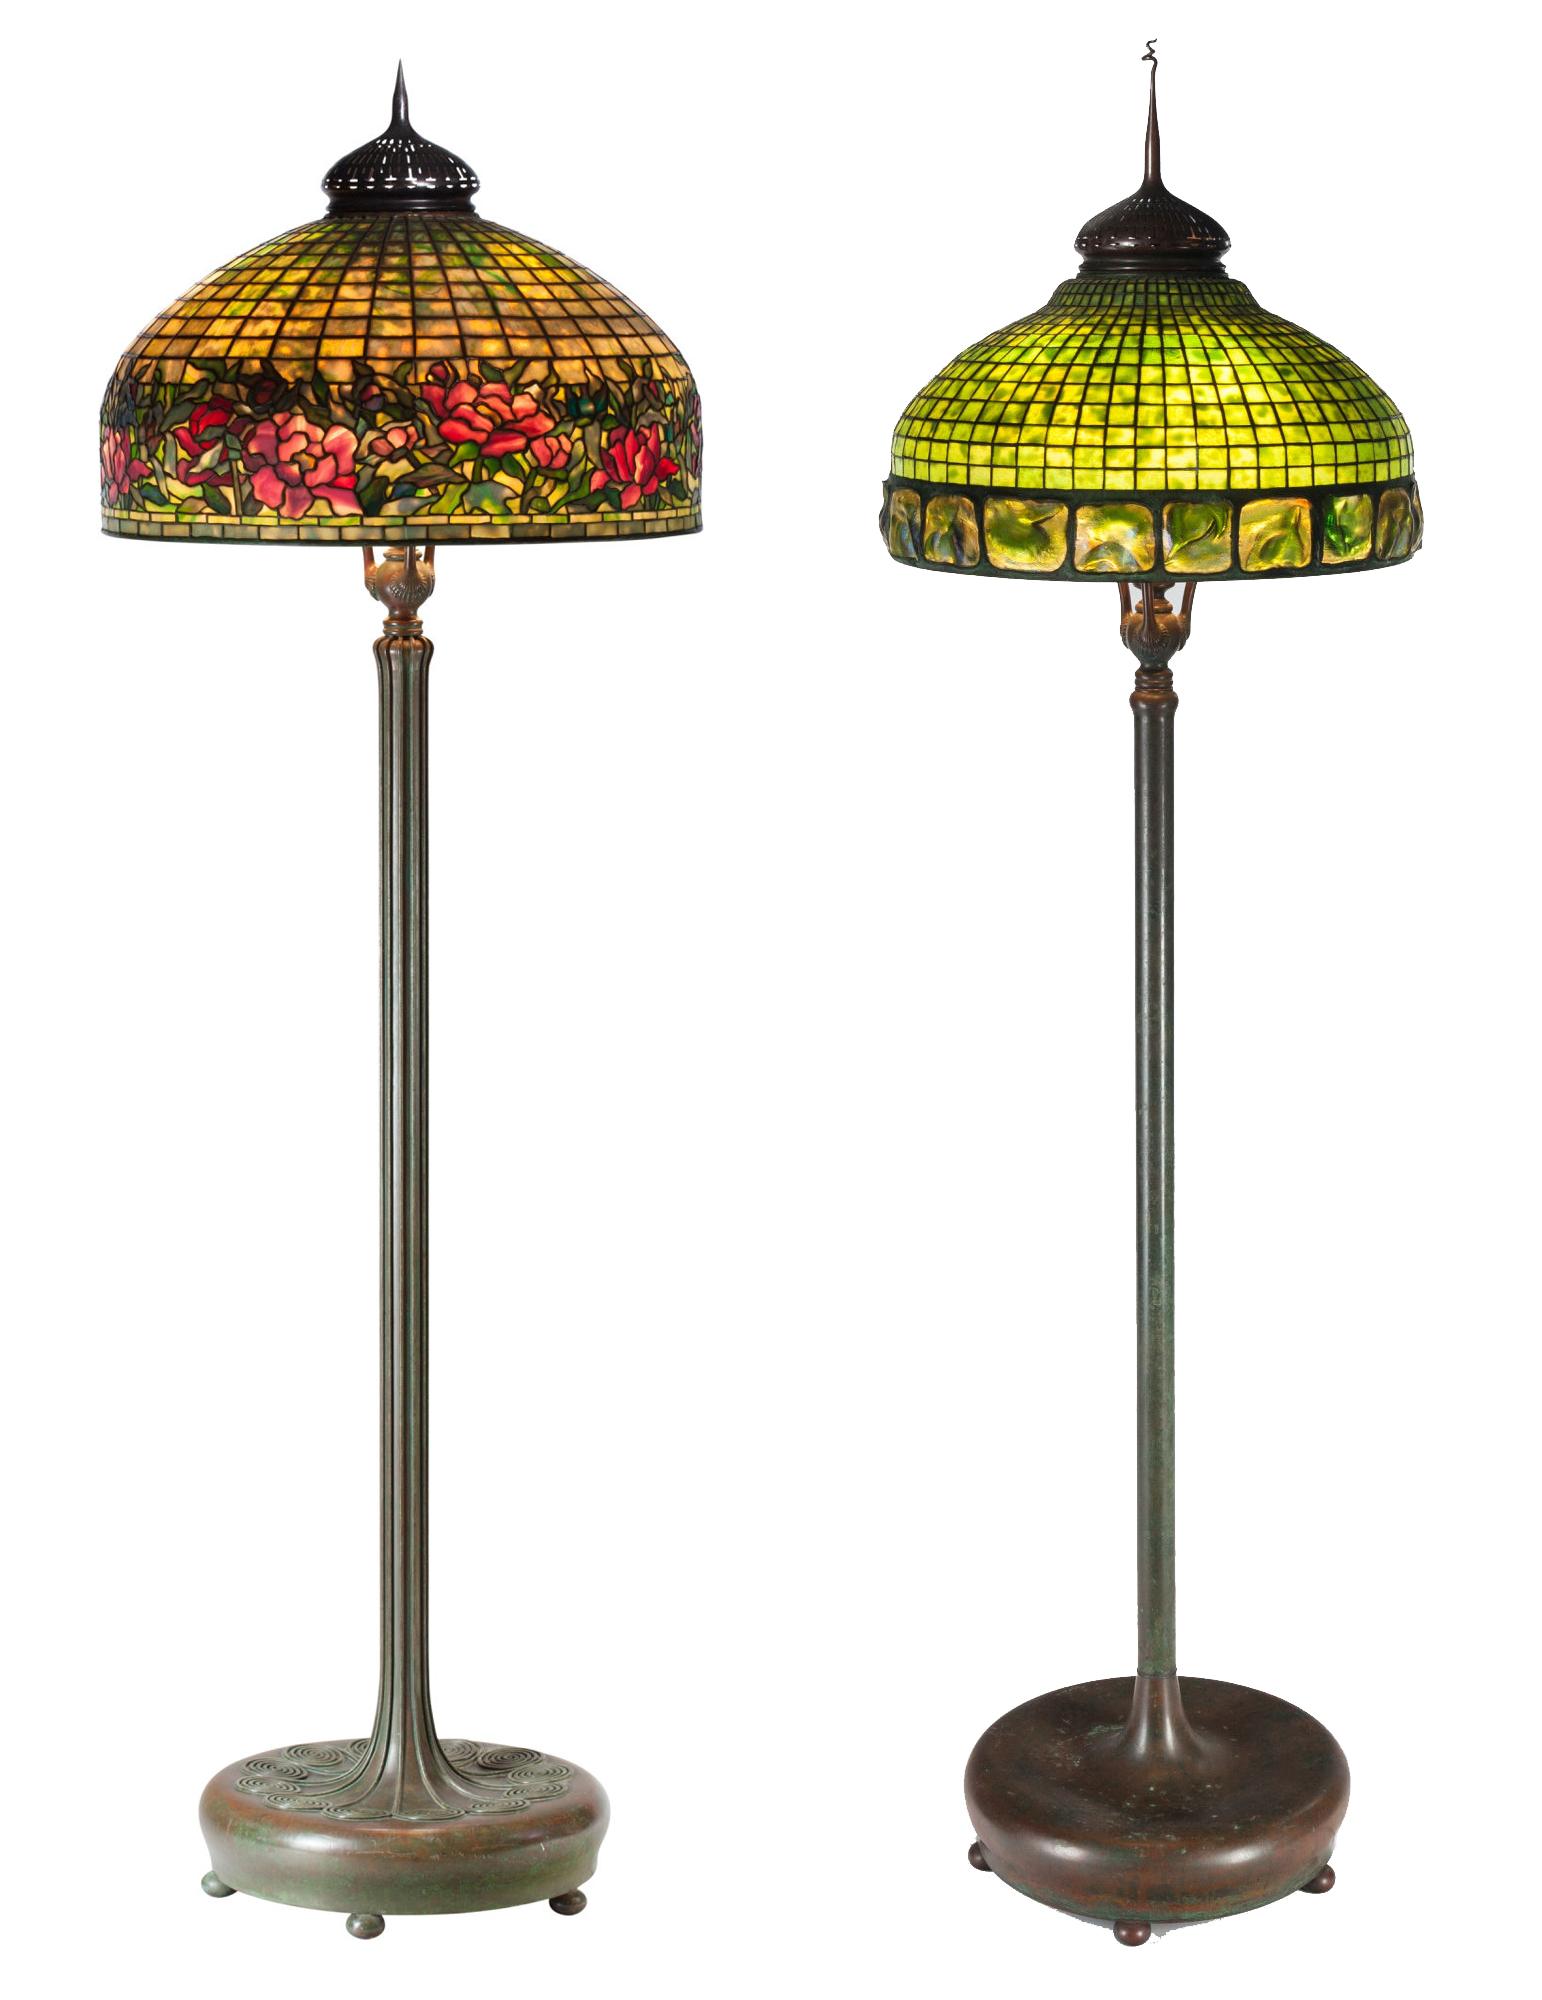 Tiffany lamps light up $2.37M fine & decorative arts sale at Heritage